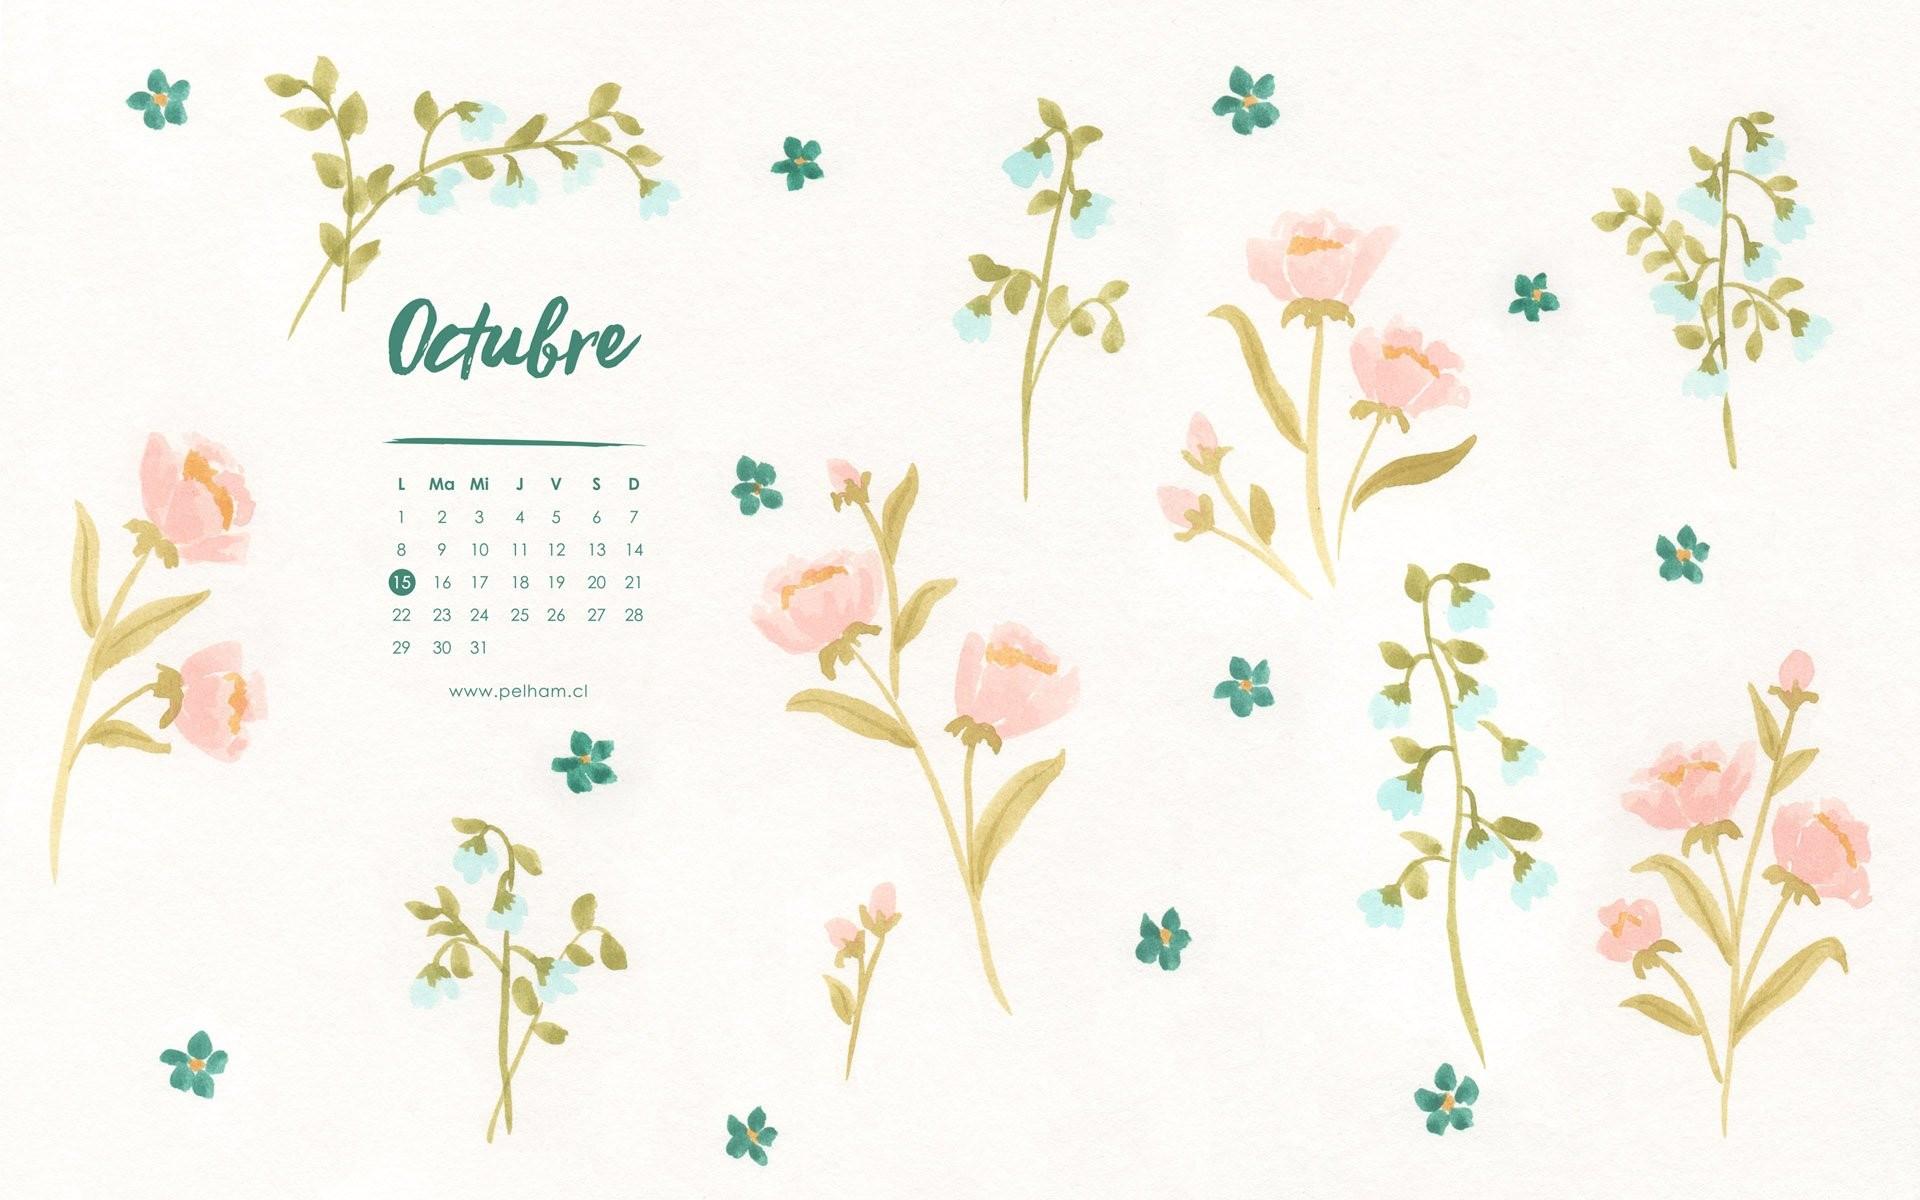 Calendario Octubre 2019 Chile Imprimir Más Recientes Wallpaper Octubre 2018 Pelham Goods Pelhamwpp